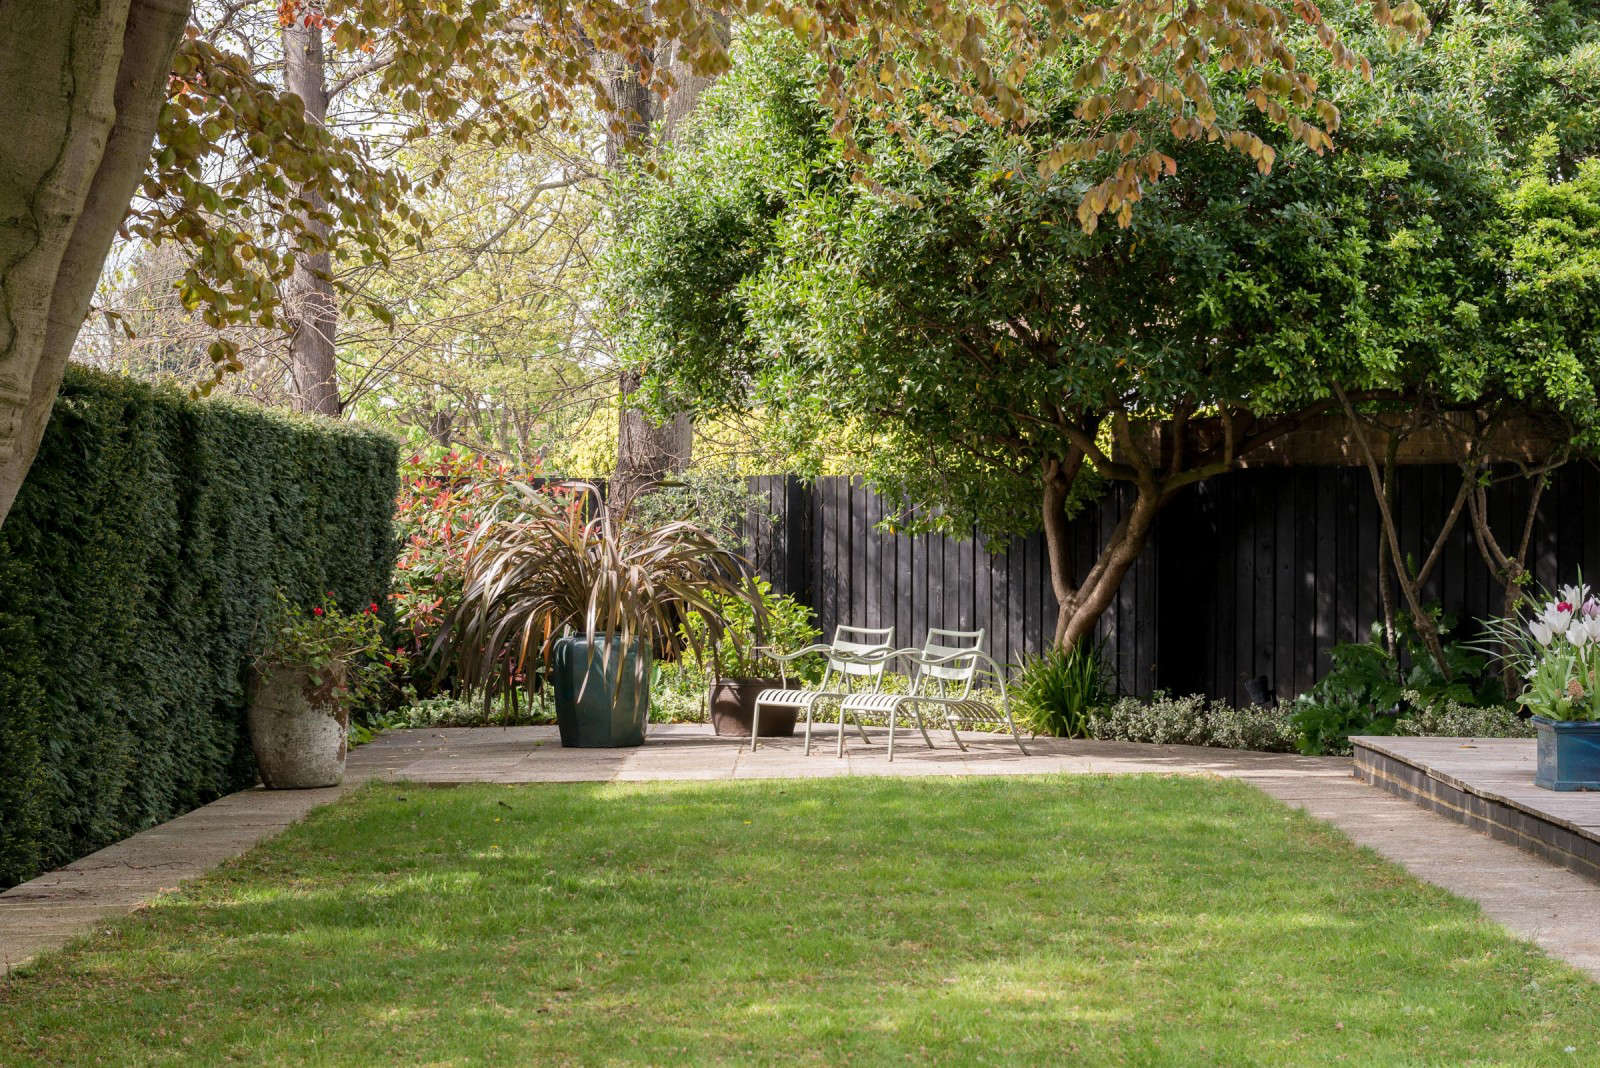 10 Garden Ideas to Steal from London - Gardenista on Mansion Backyard Ideas id=65397